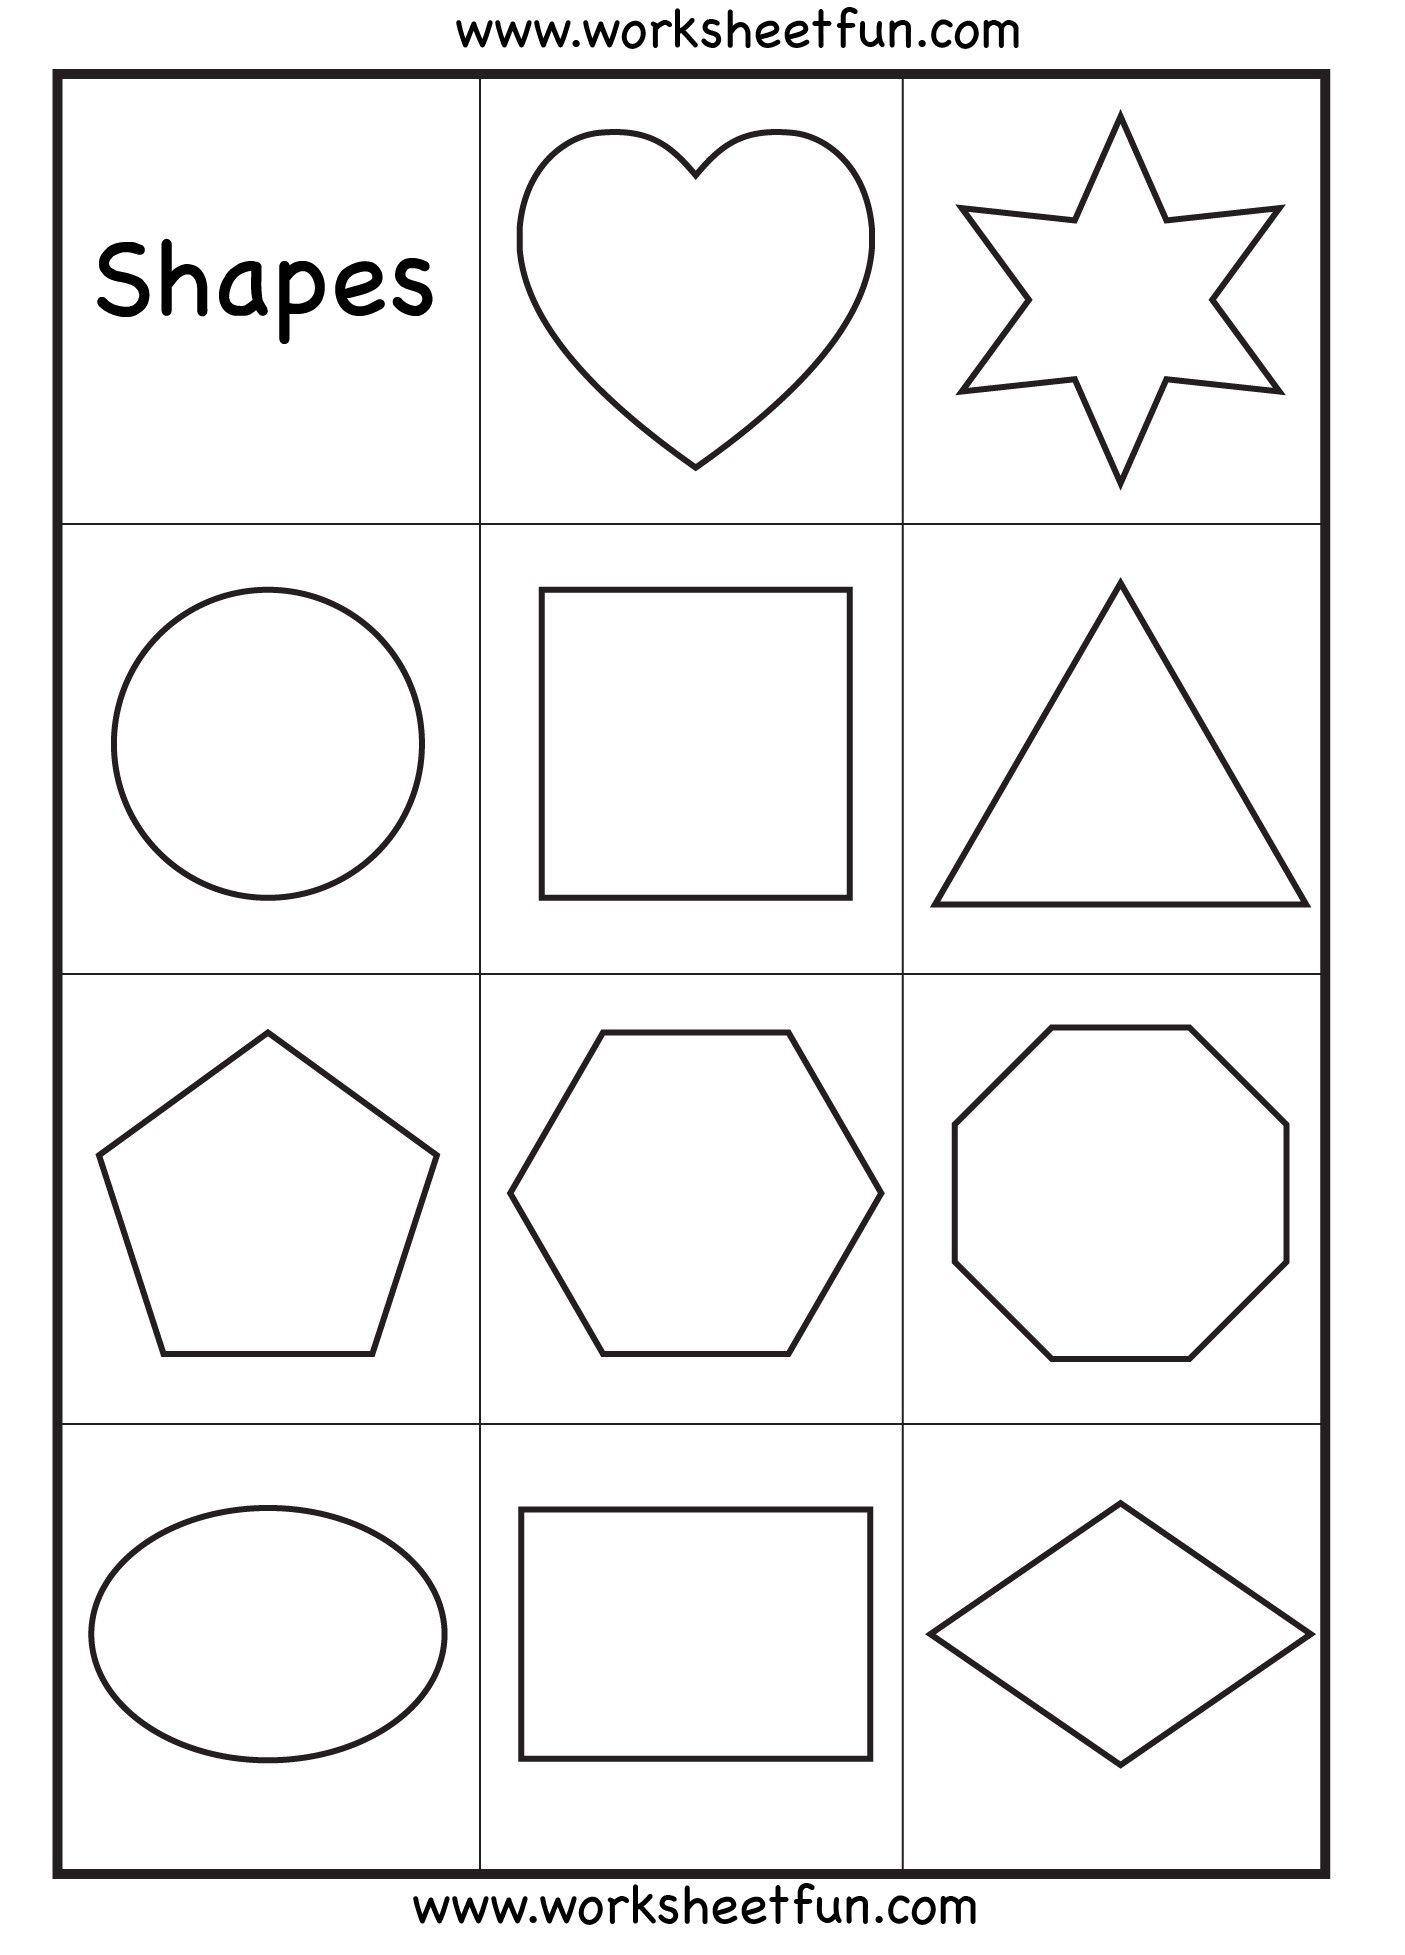 4 Worksheet Shape It Up